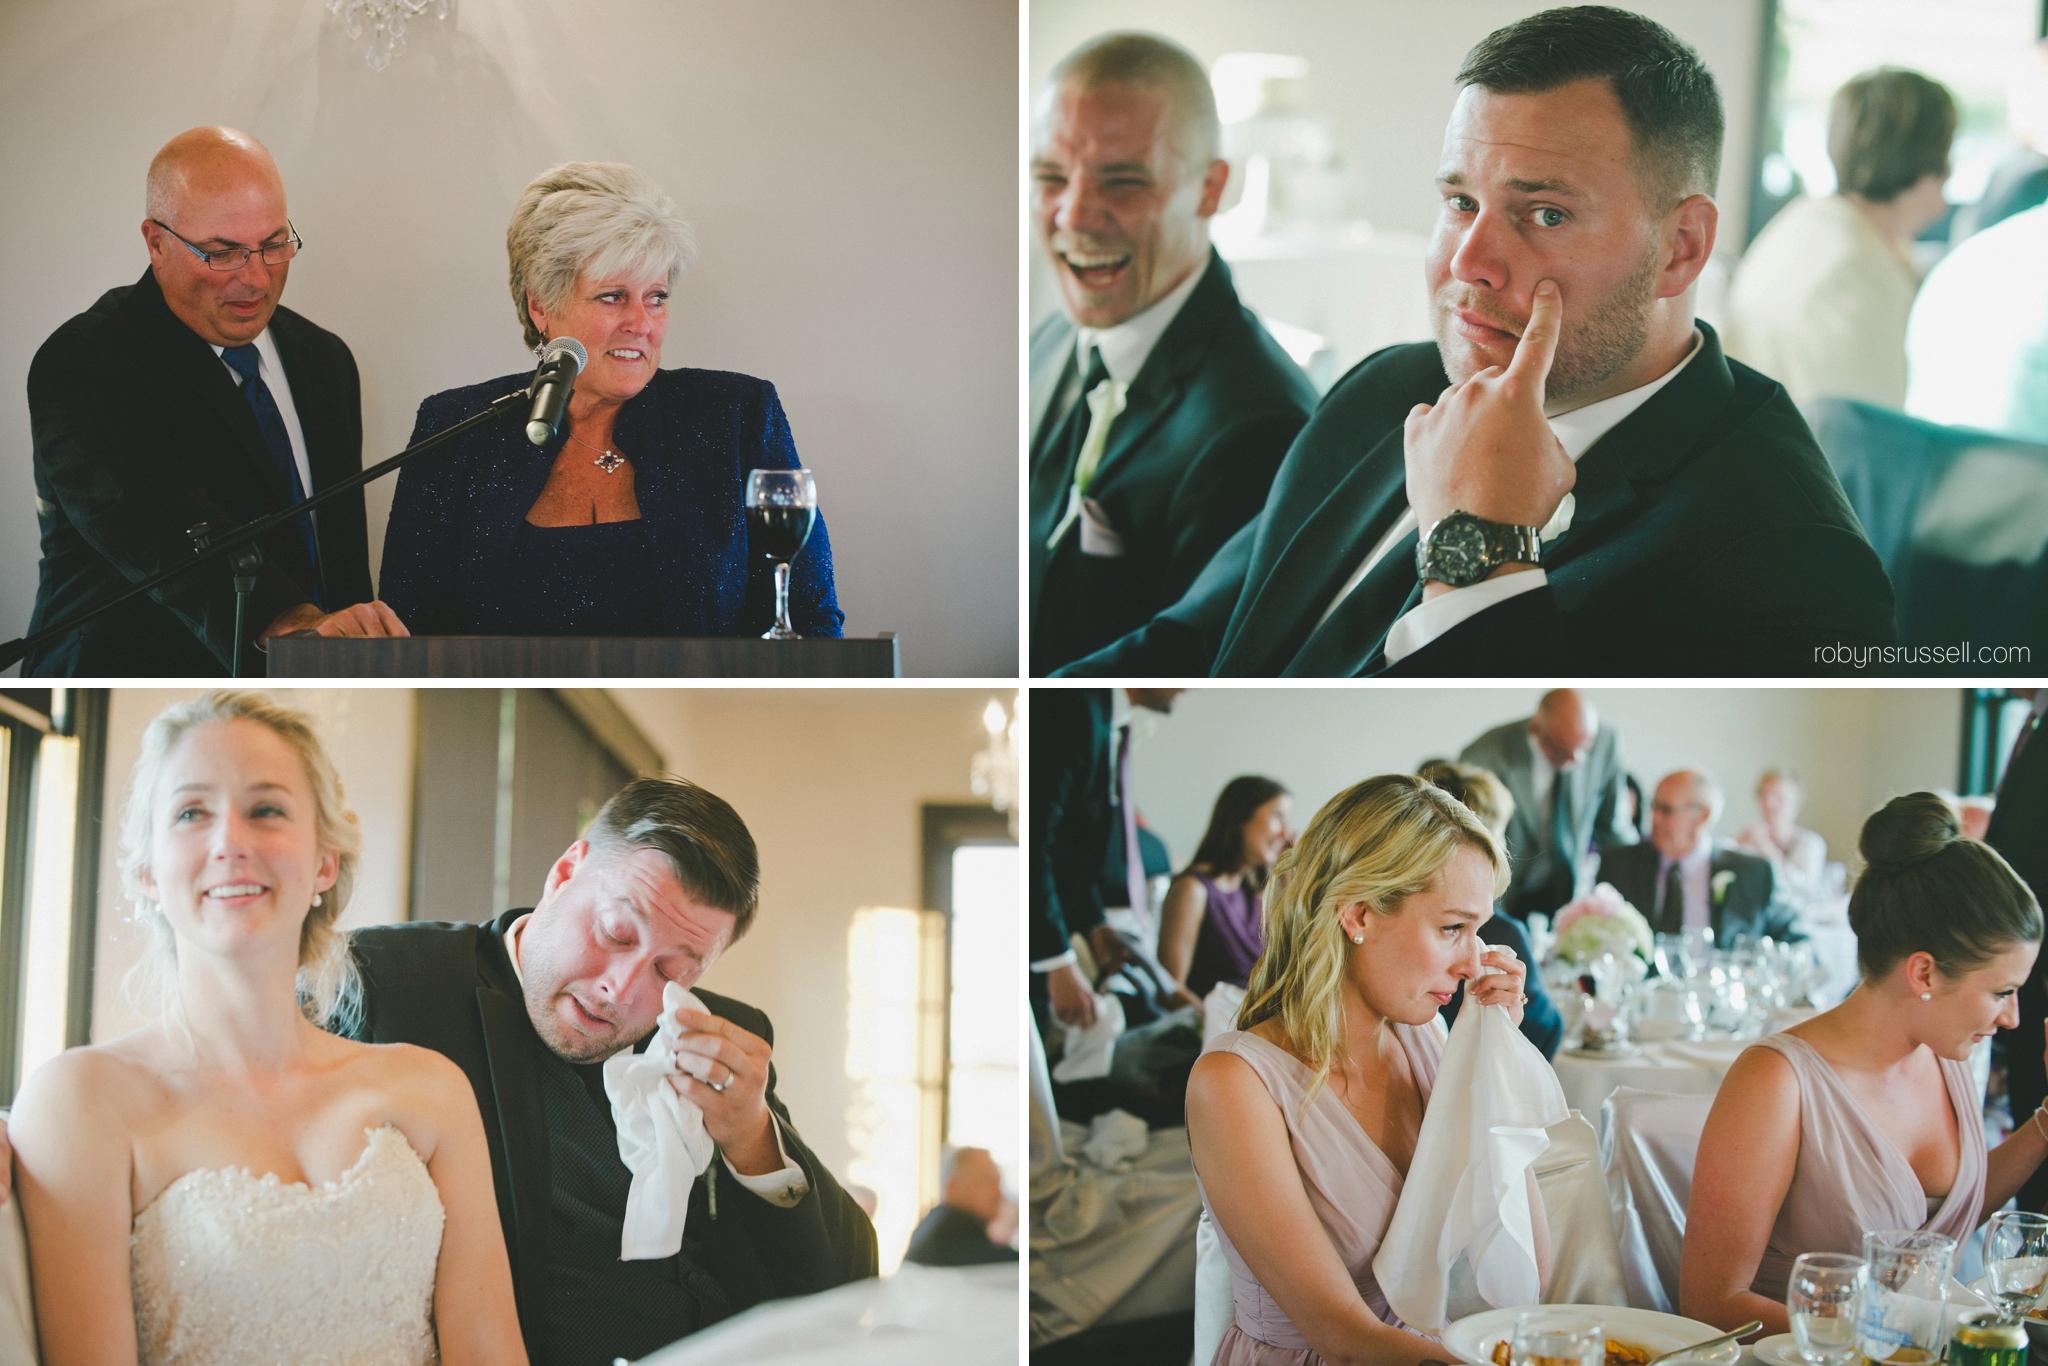 62-wedding-toasts-emotion-moments.jpg